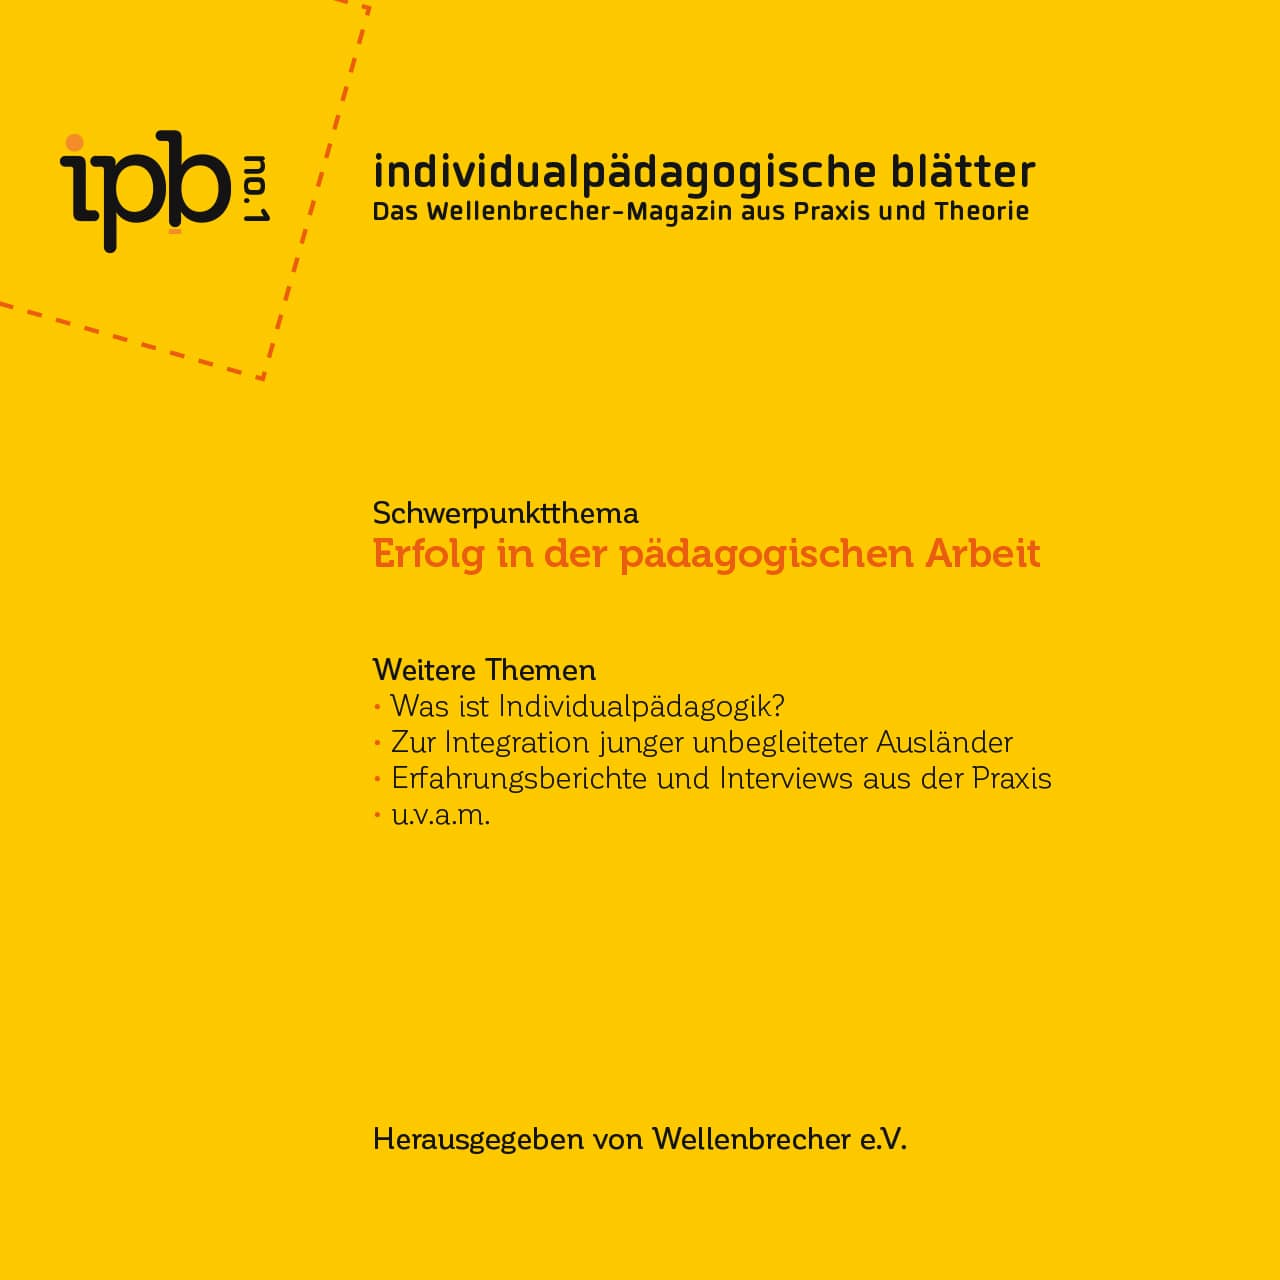 Individualpädagogische Blätter Nr. 1